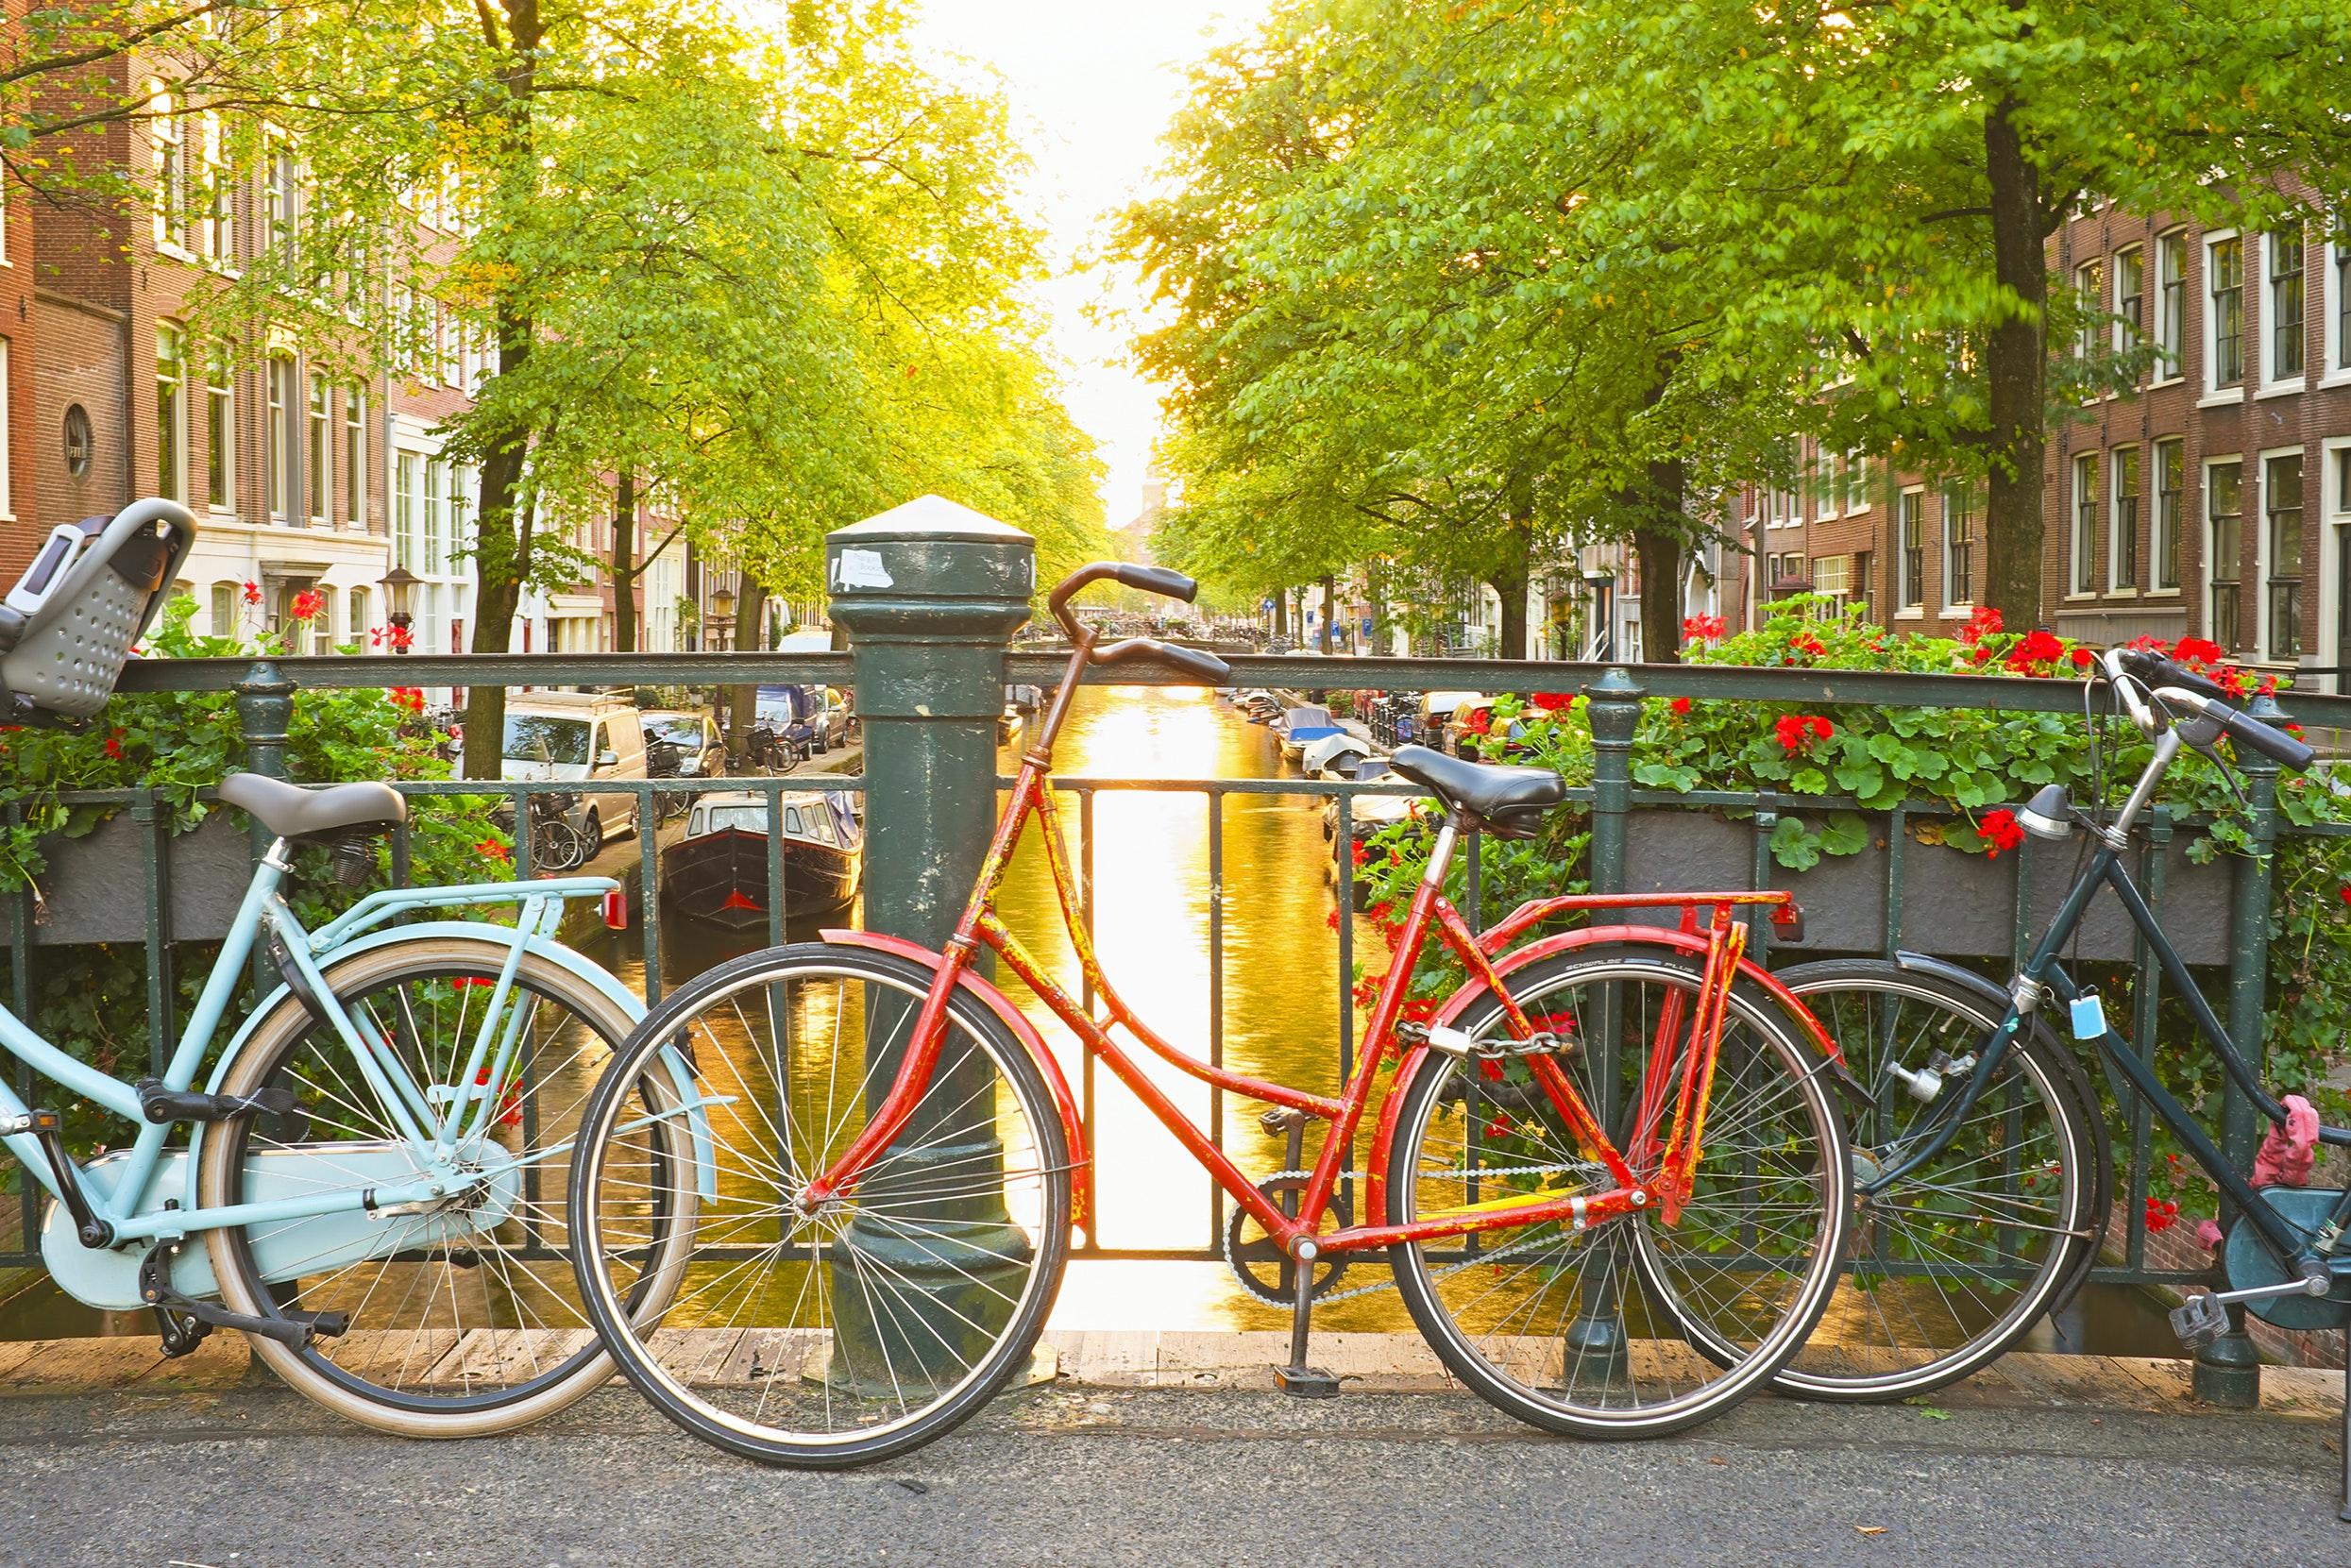 fietsen langs de gracht in Amsterdam